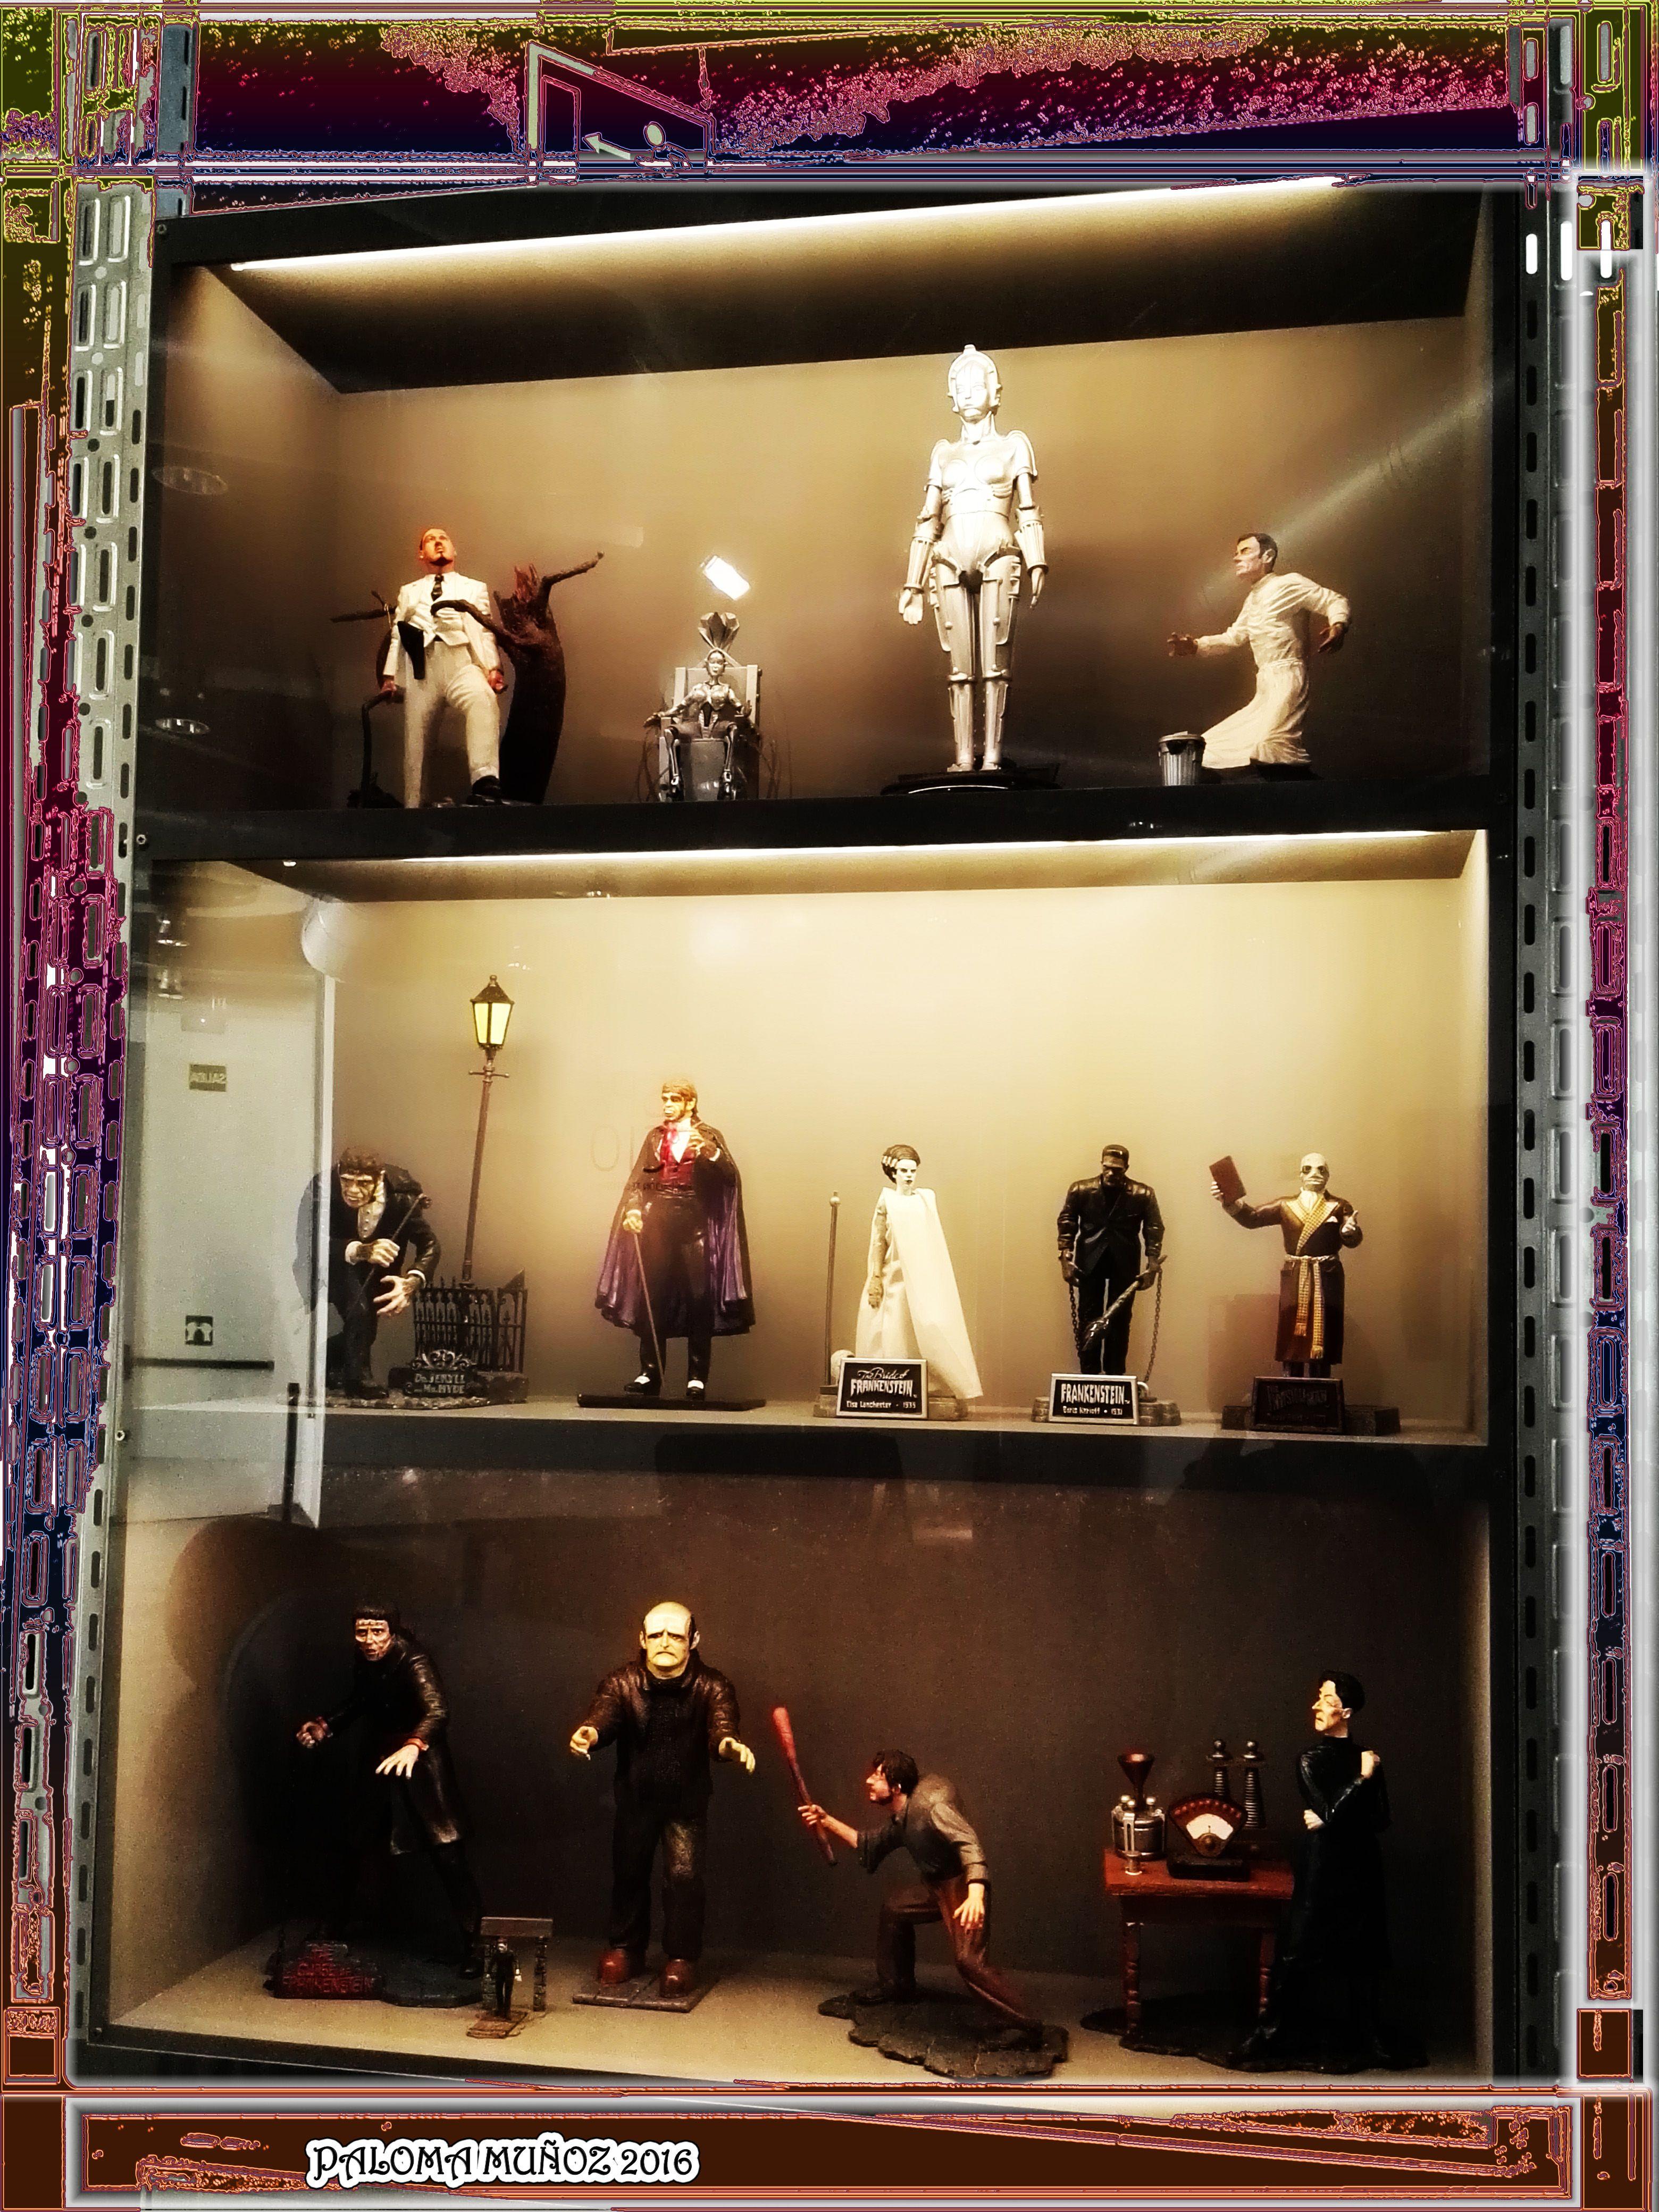 La vitrina con los monstruos del laboratorio del terror. The showcase with monsters horror lab